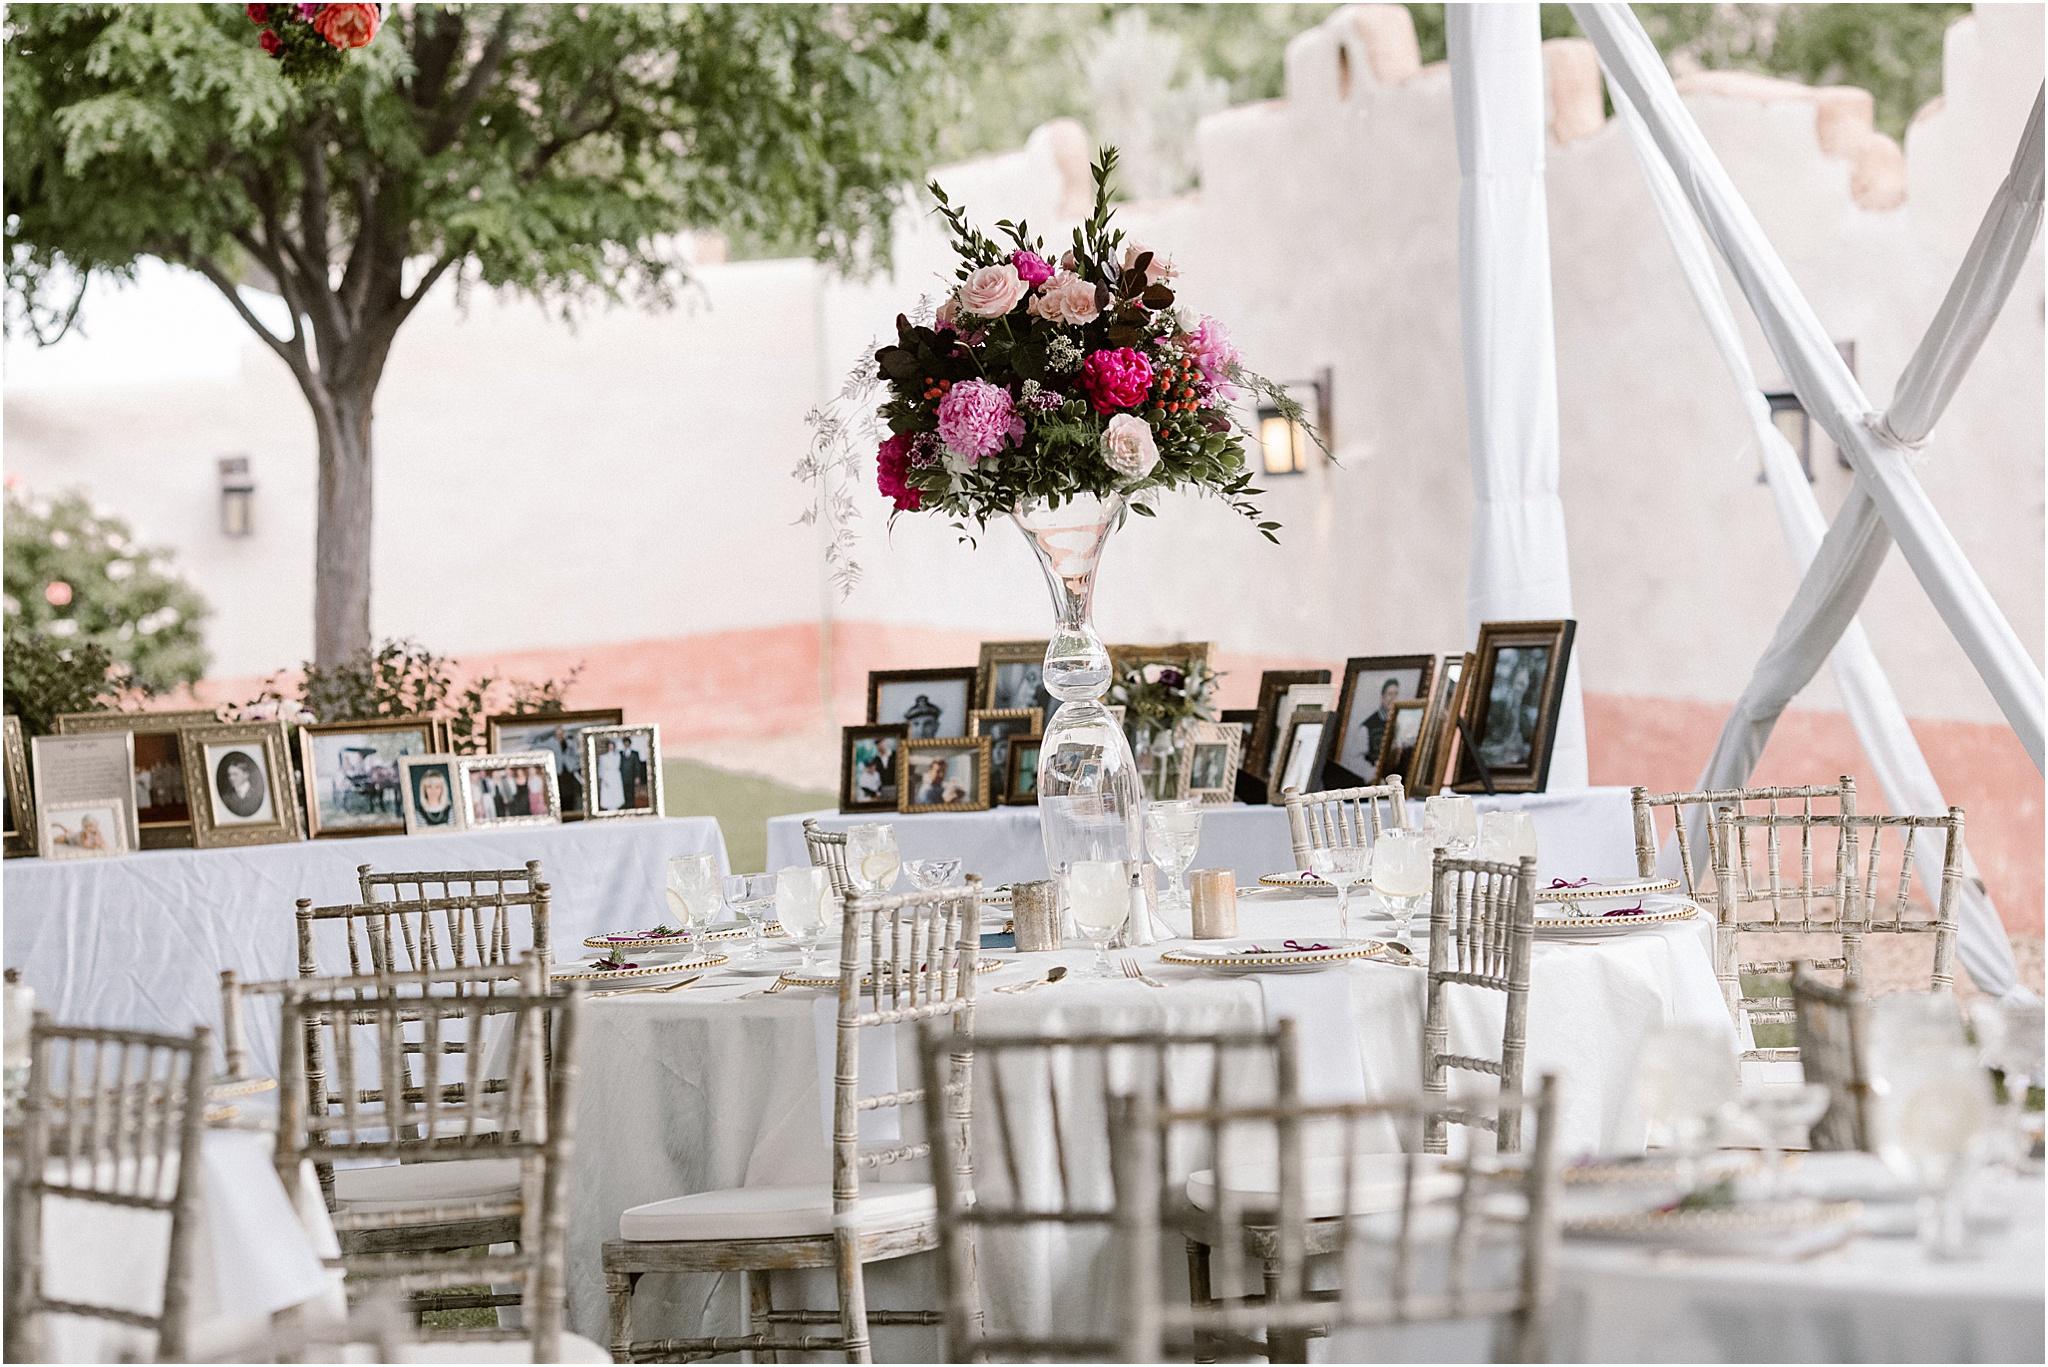 JENNA_JEROME_BLUE ROSE PHOTOGRAPHY_ABQ WEDDING_45